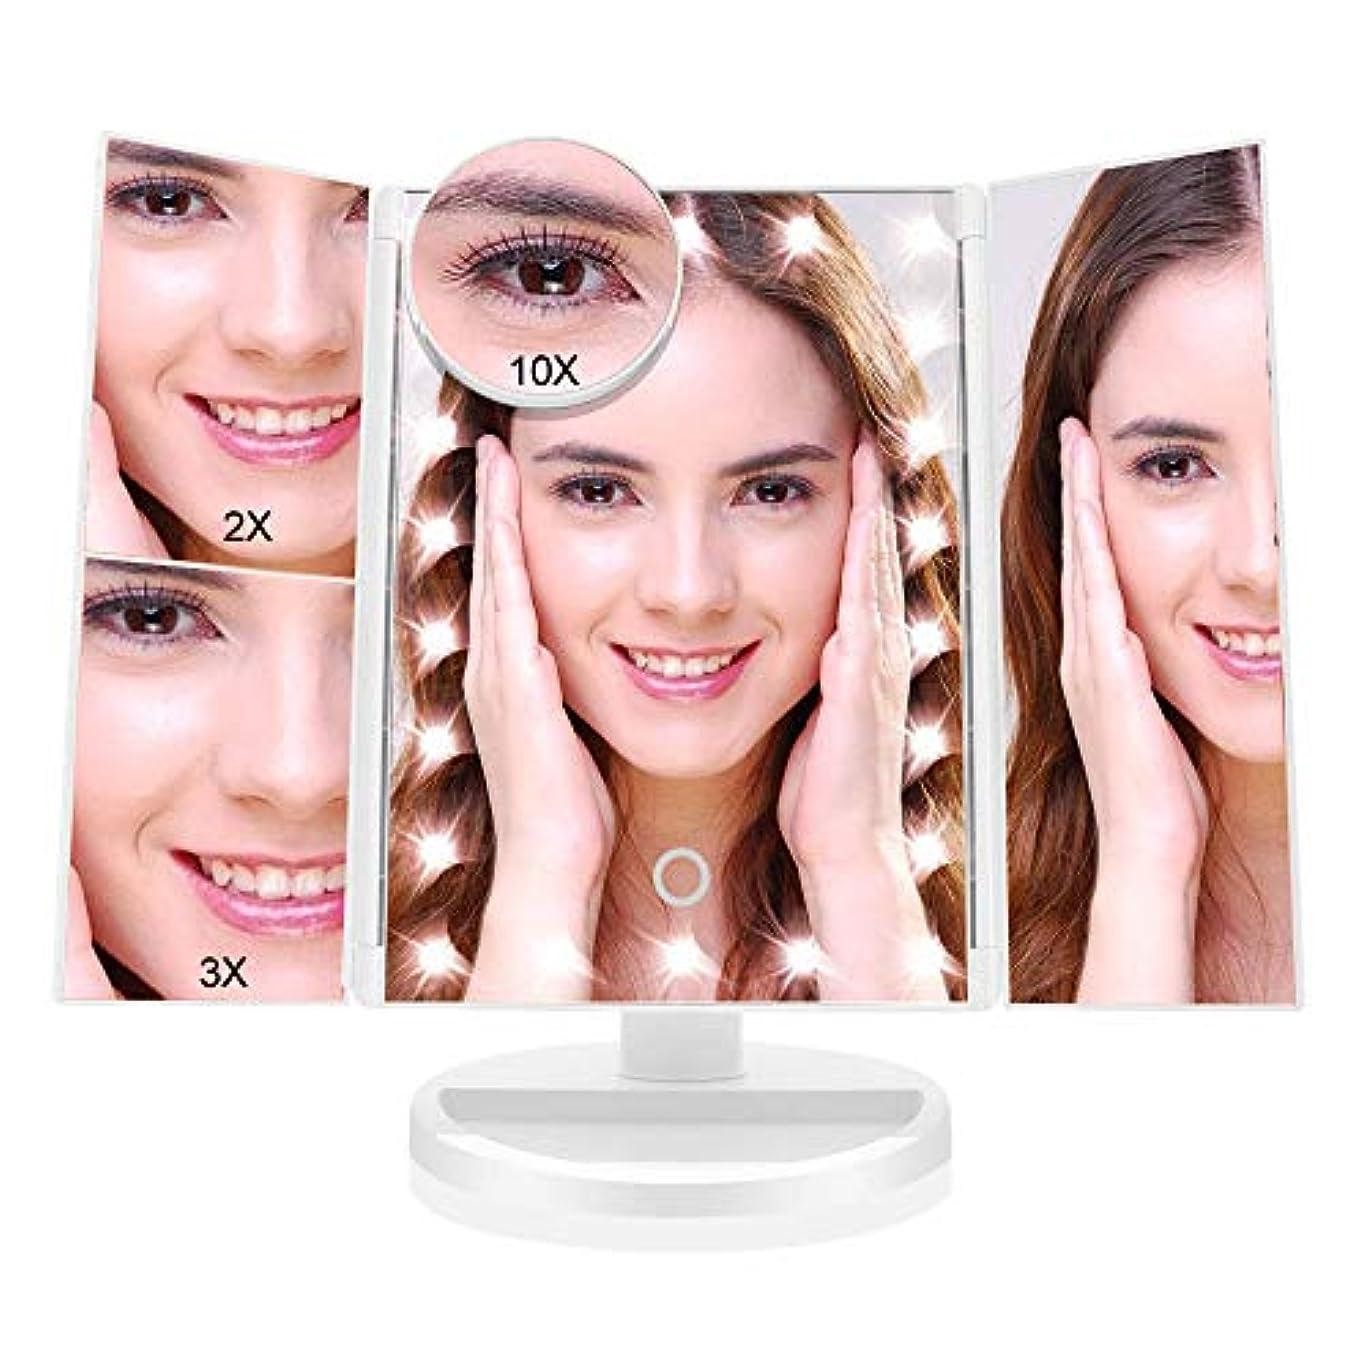 冗談でビール触覚化粧鏡 化粧ミラー 鏡 三面鏡 女優 卓上 21個LED付き 拡大鏡 2X 3X 10X 倍 明るさ調節可能 180°回転 電池&USB2WAY給電 収納便利